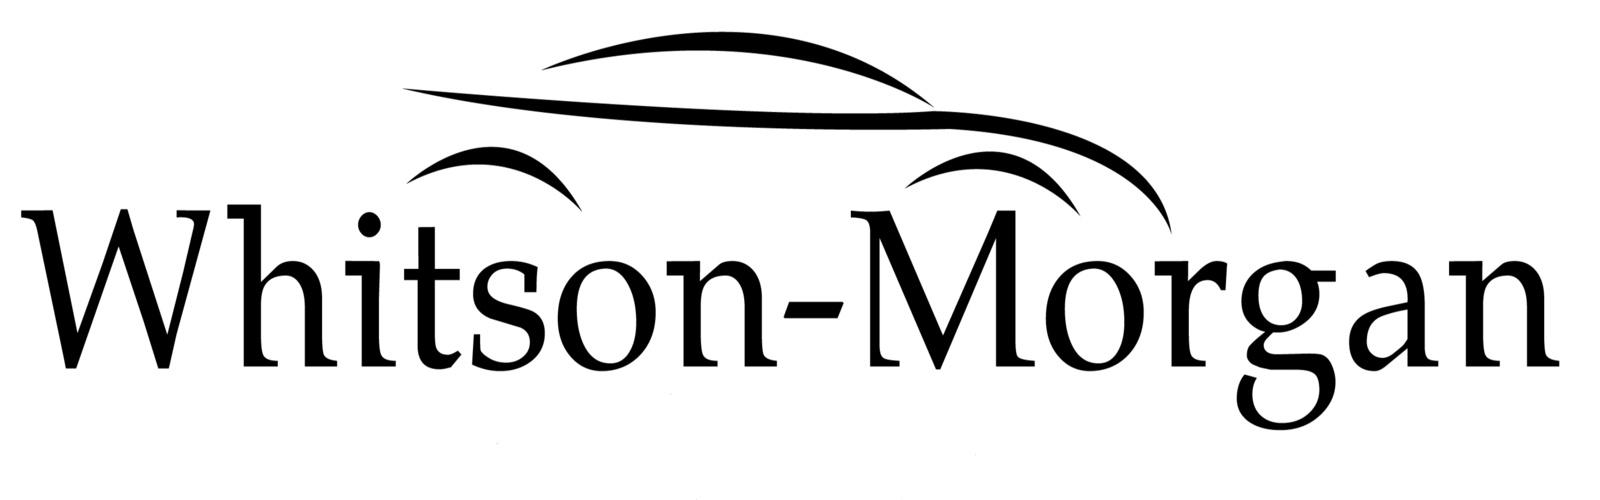 Whitson morgan motor company chrysler dodge jeep ram for Whitson morgan motors clarksville ar